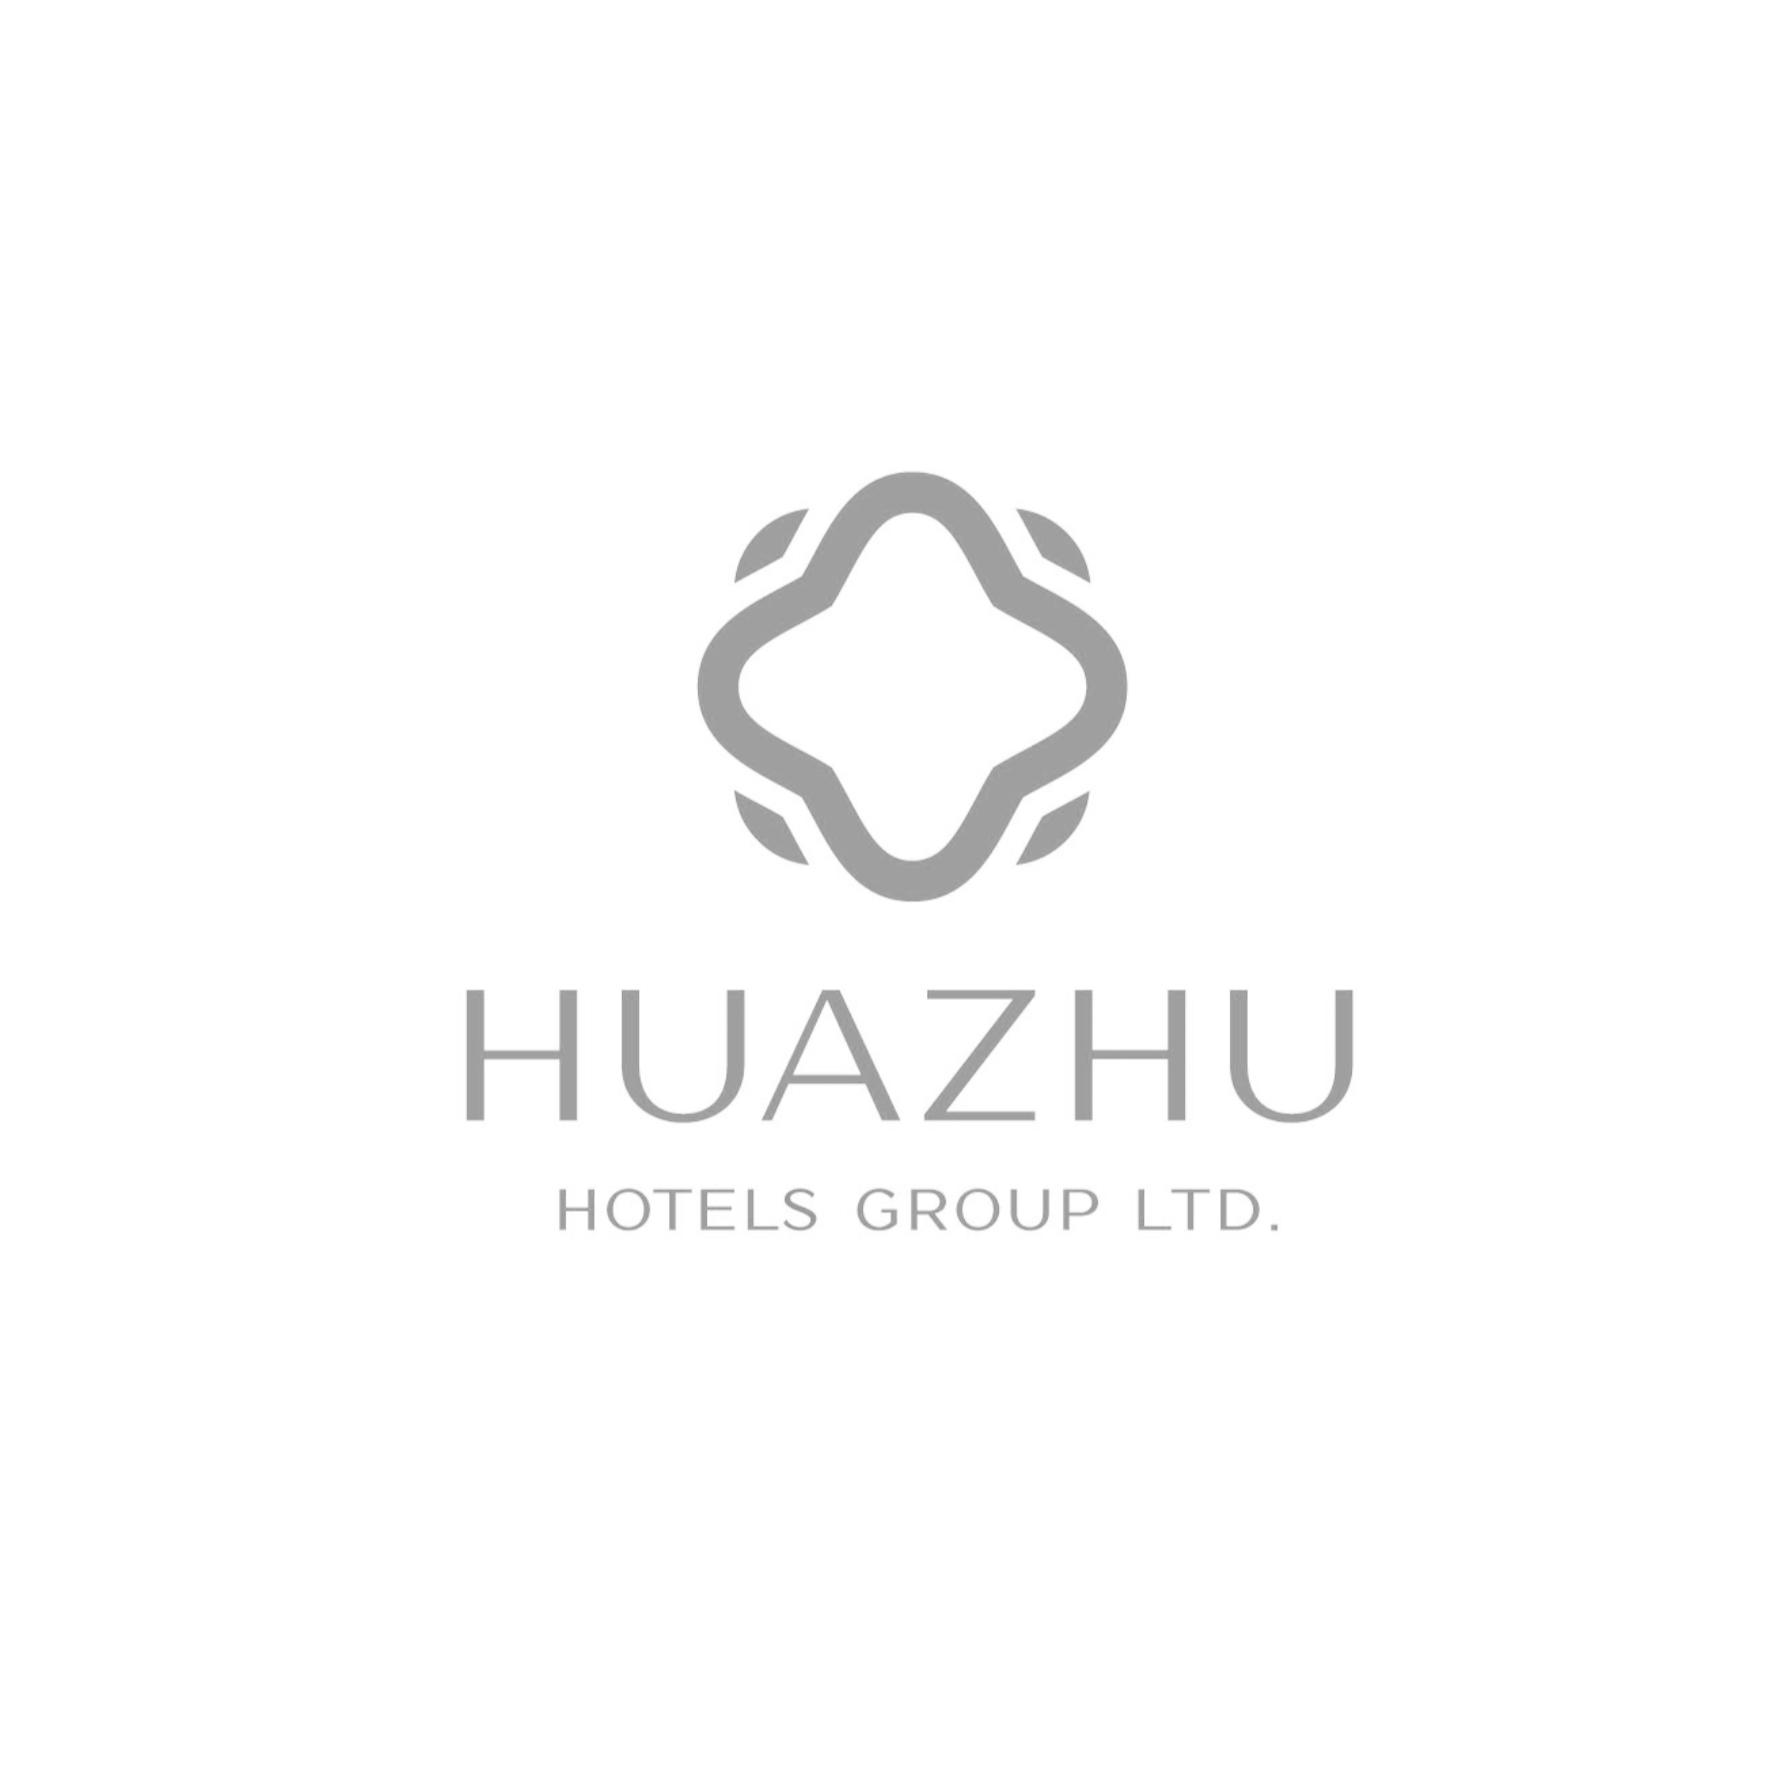 Huazhu